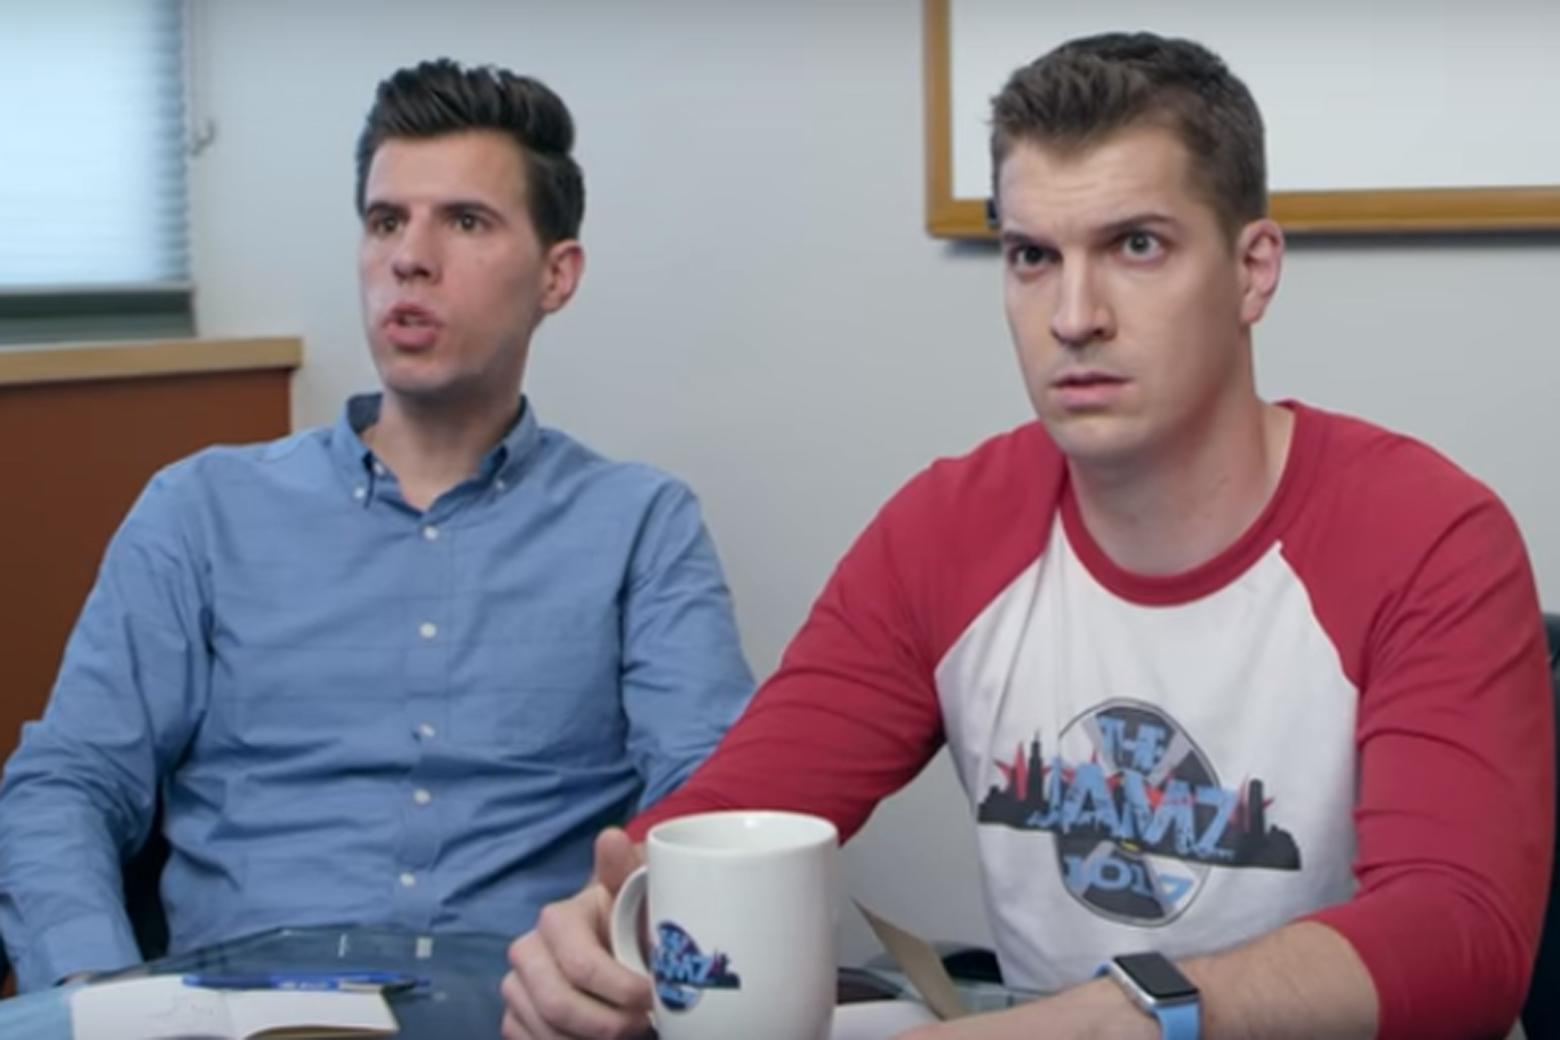 Real-life radio hijinks inspire comedy web series 'The Jamz'